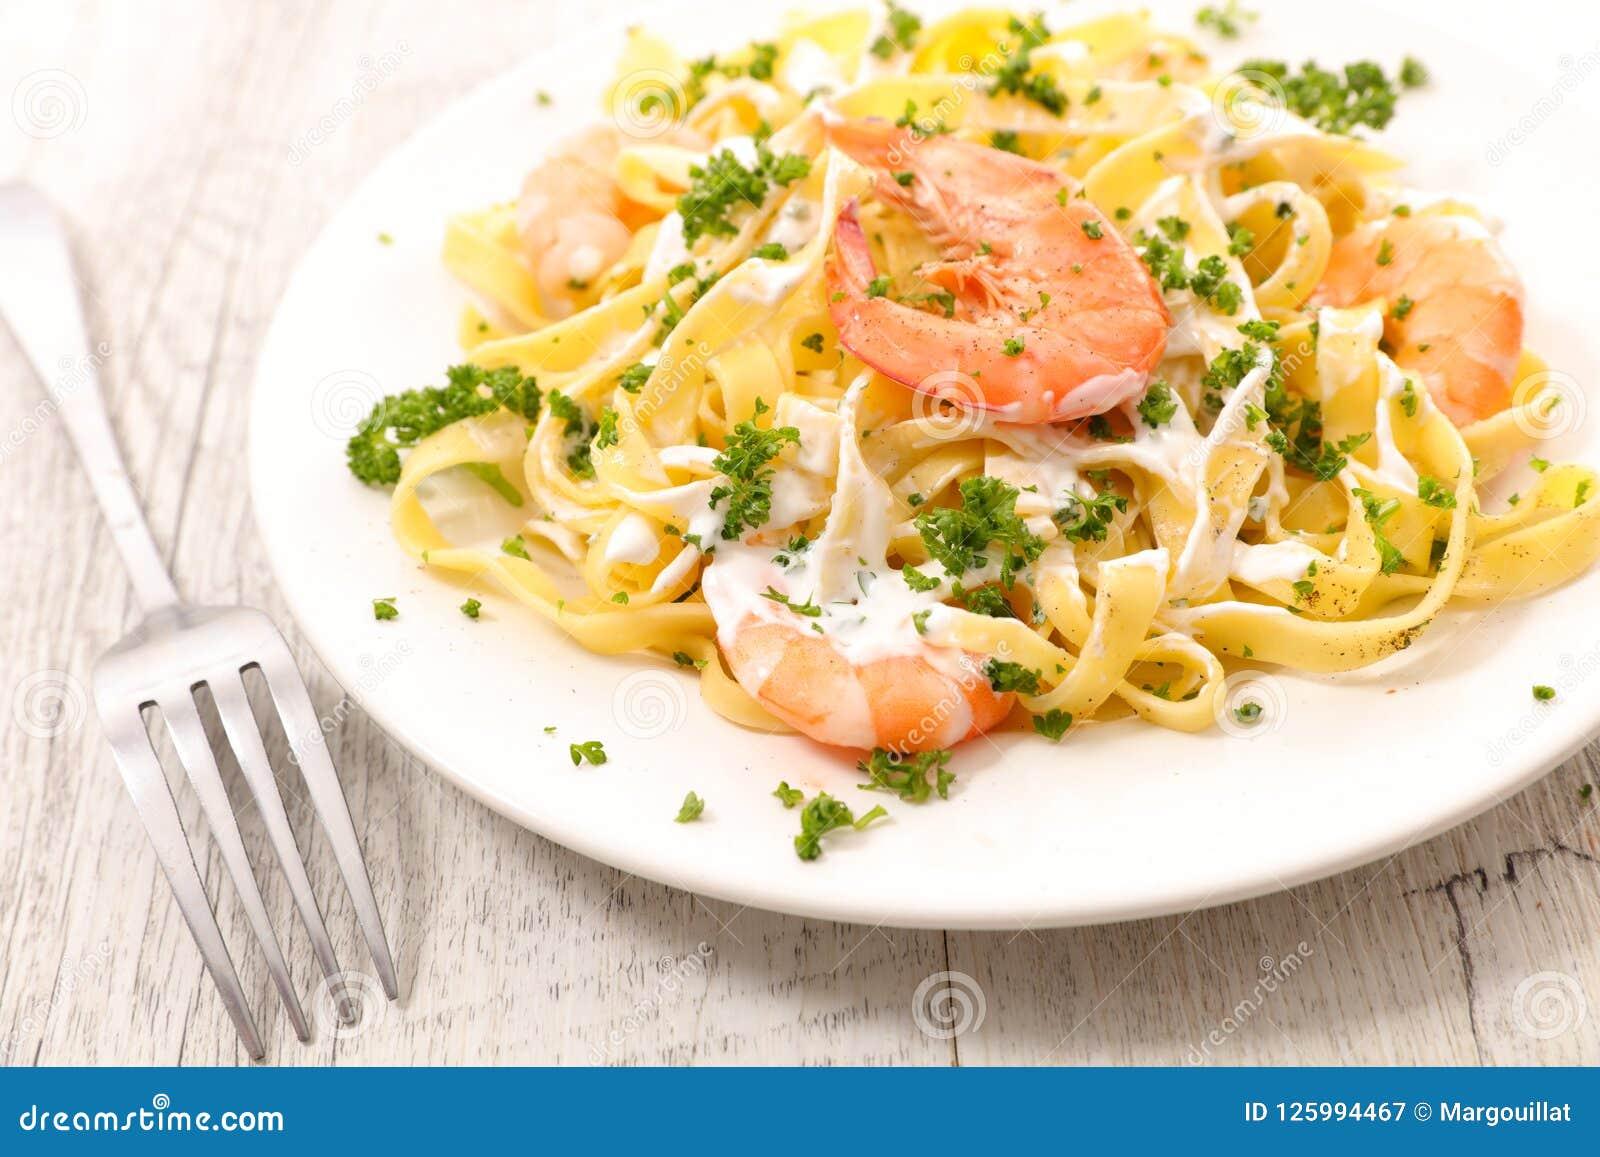 Tagliatelle with shrimp